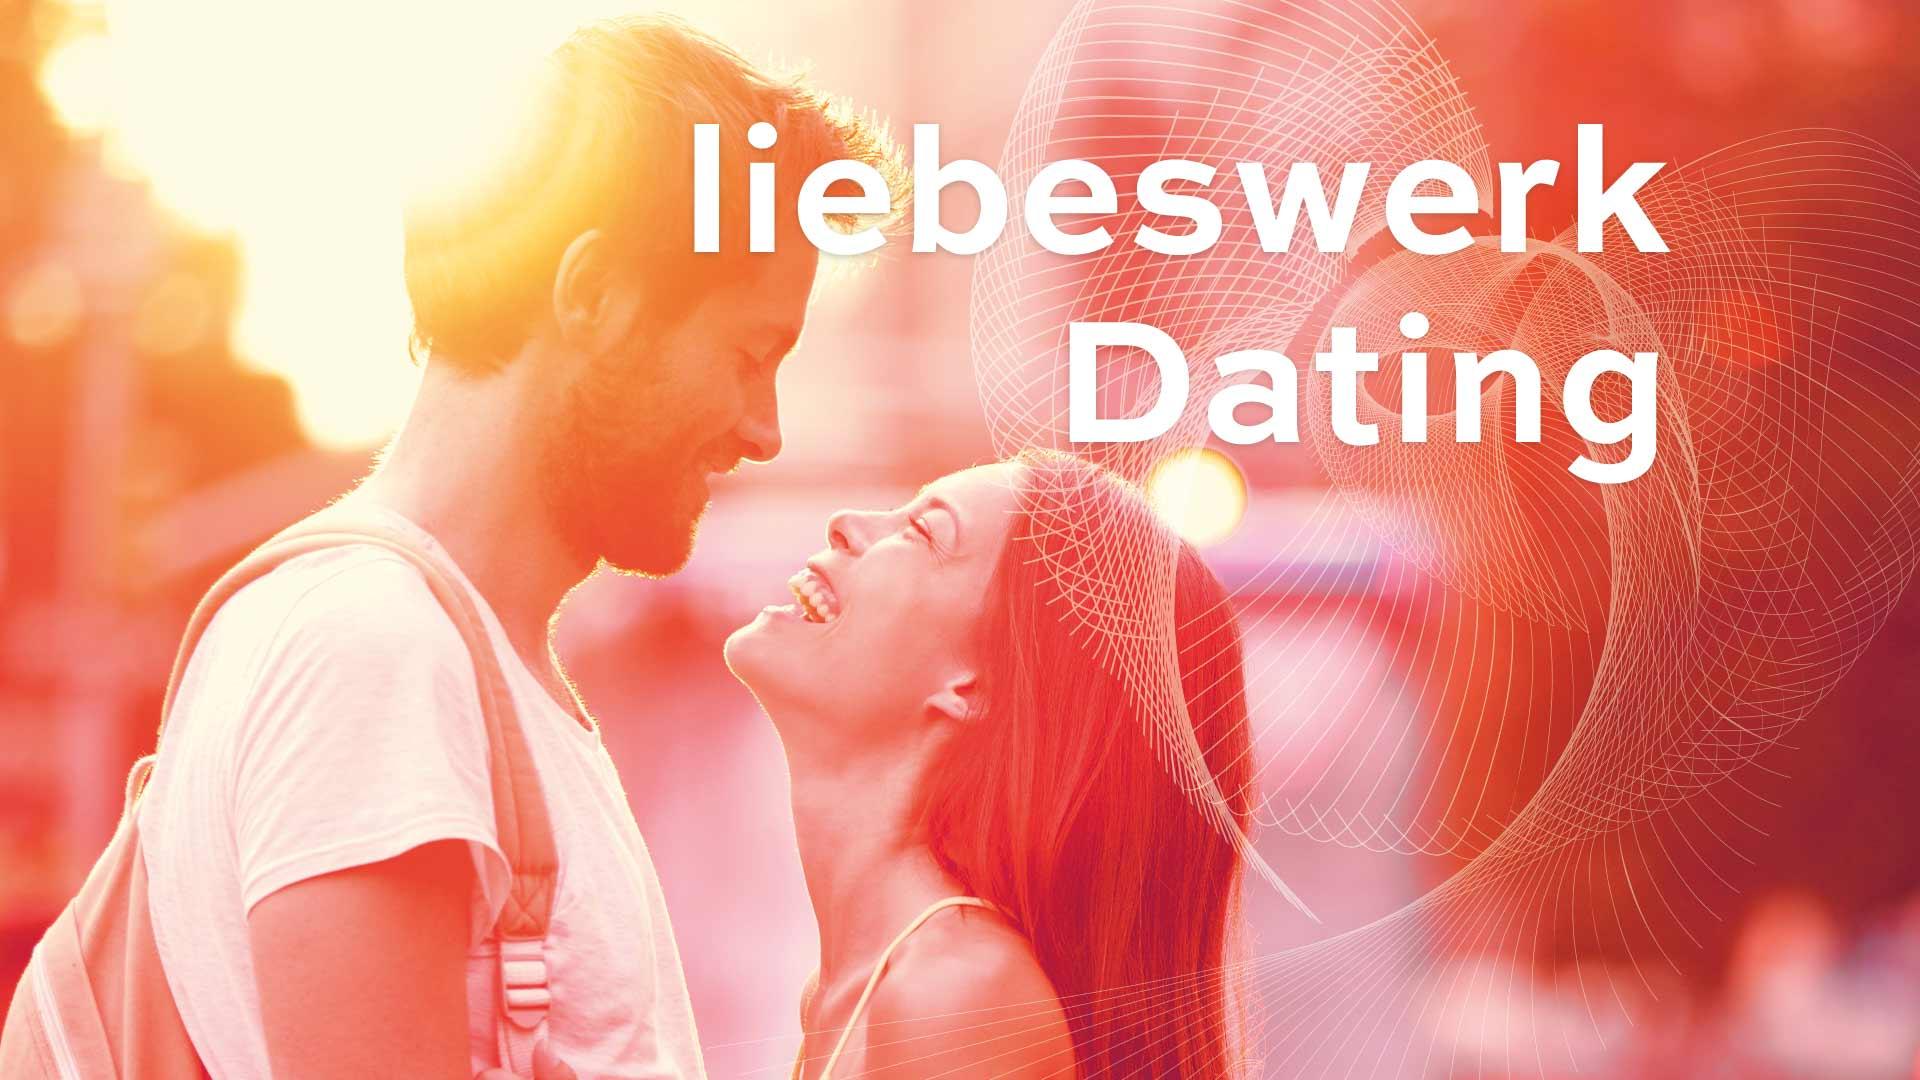 liebeswerk Dating